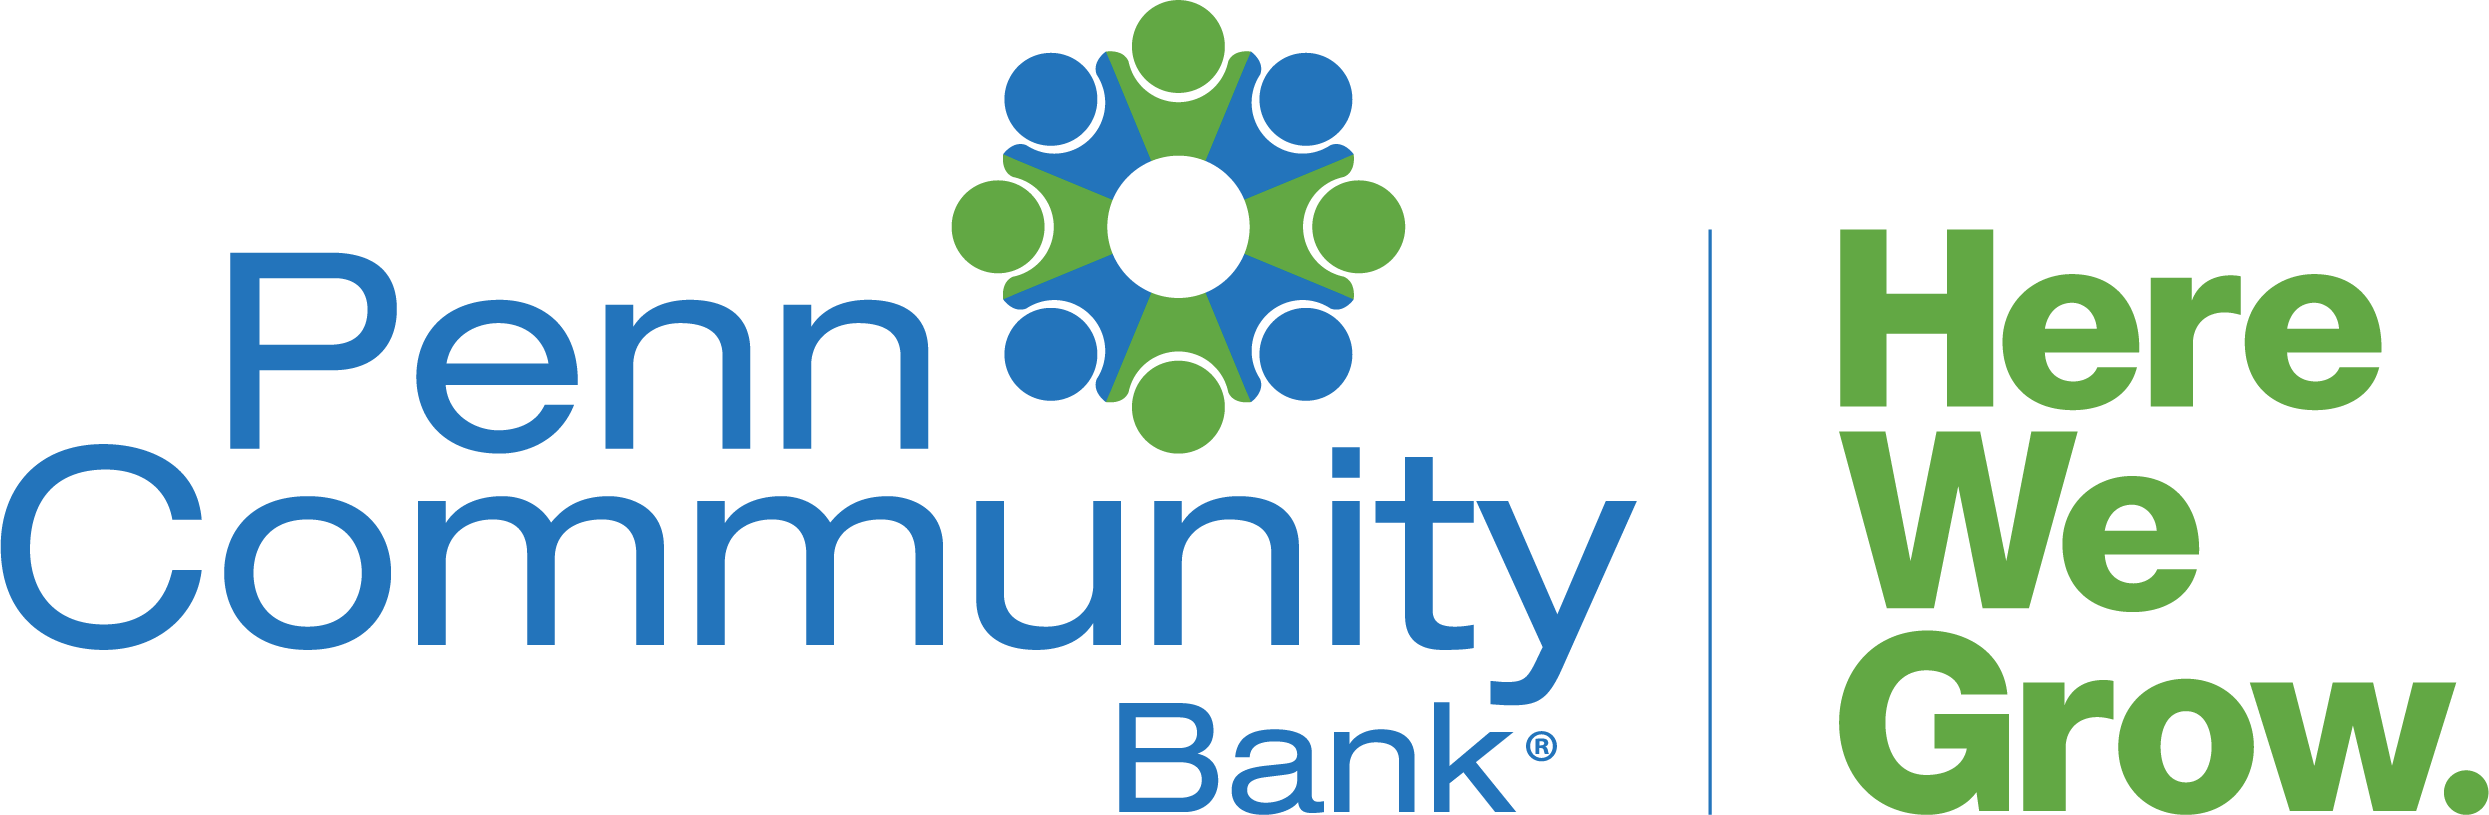 Penn Community Bank Logo. Here We Grow